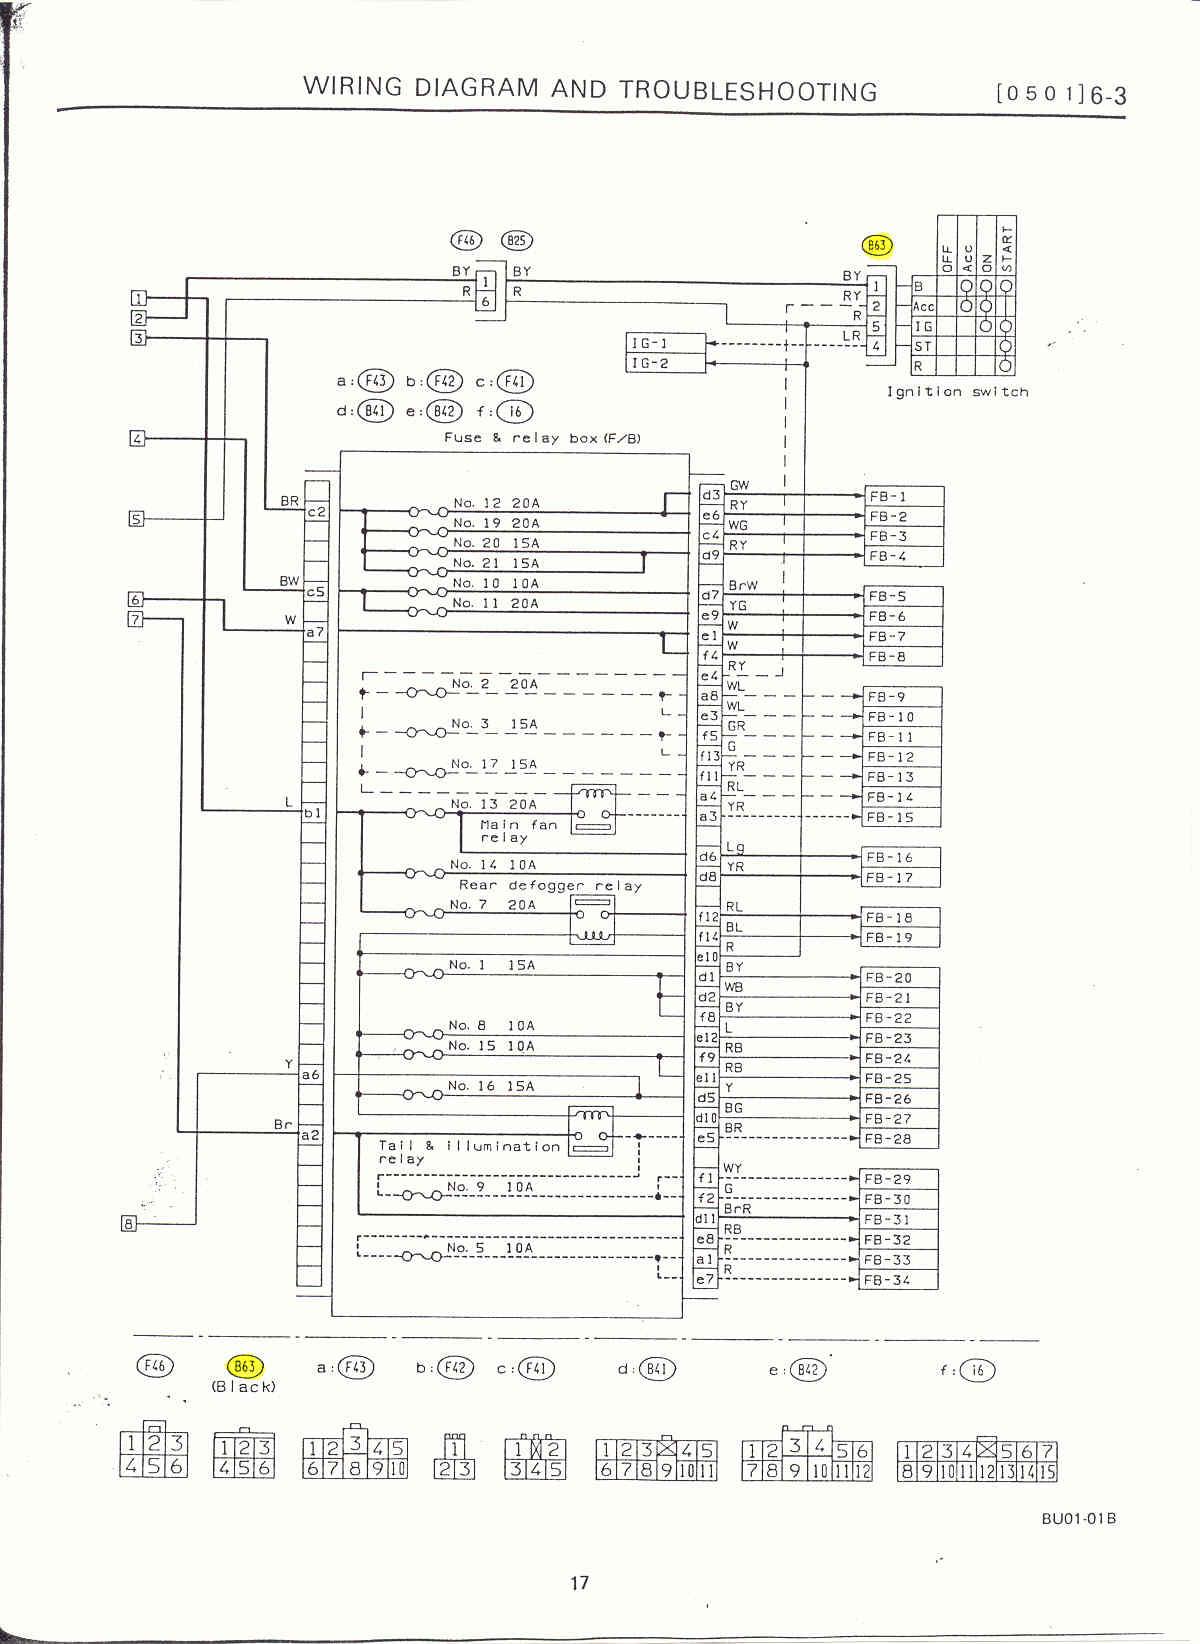 subaru b4 wiring diagram